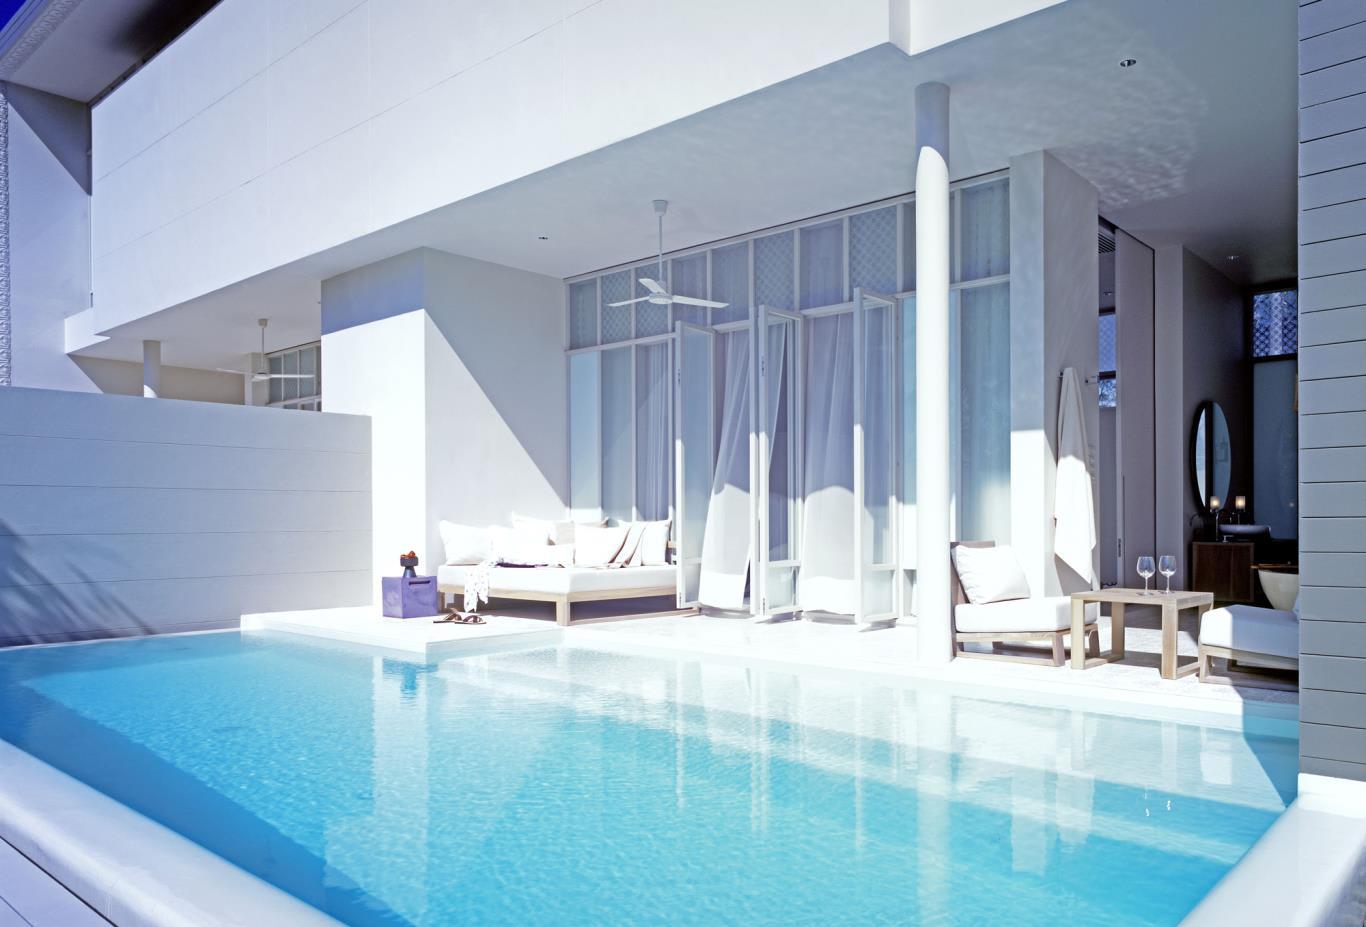 Garden-Pool-Villa-Pool